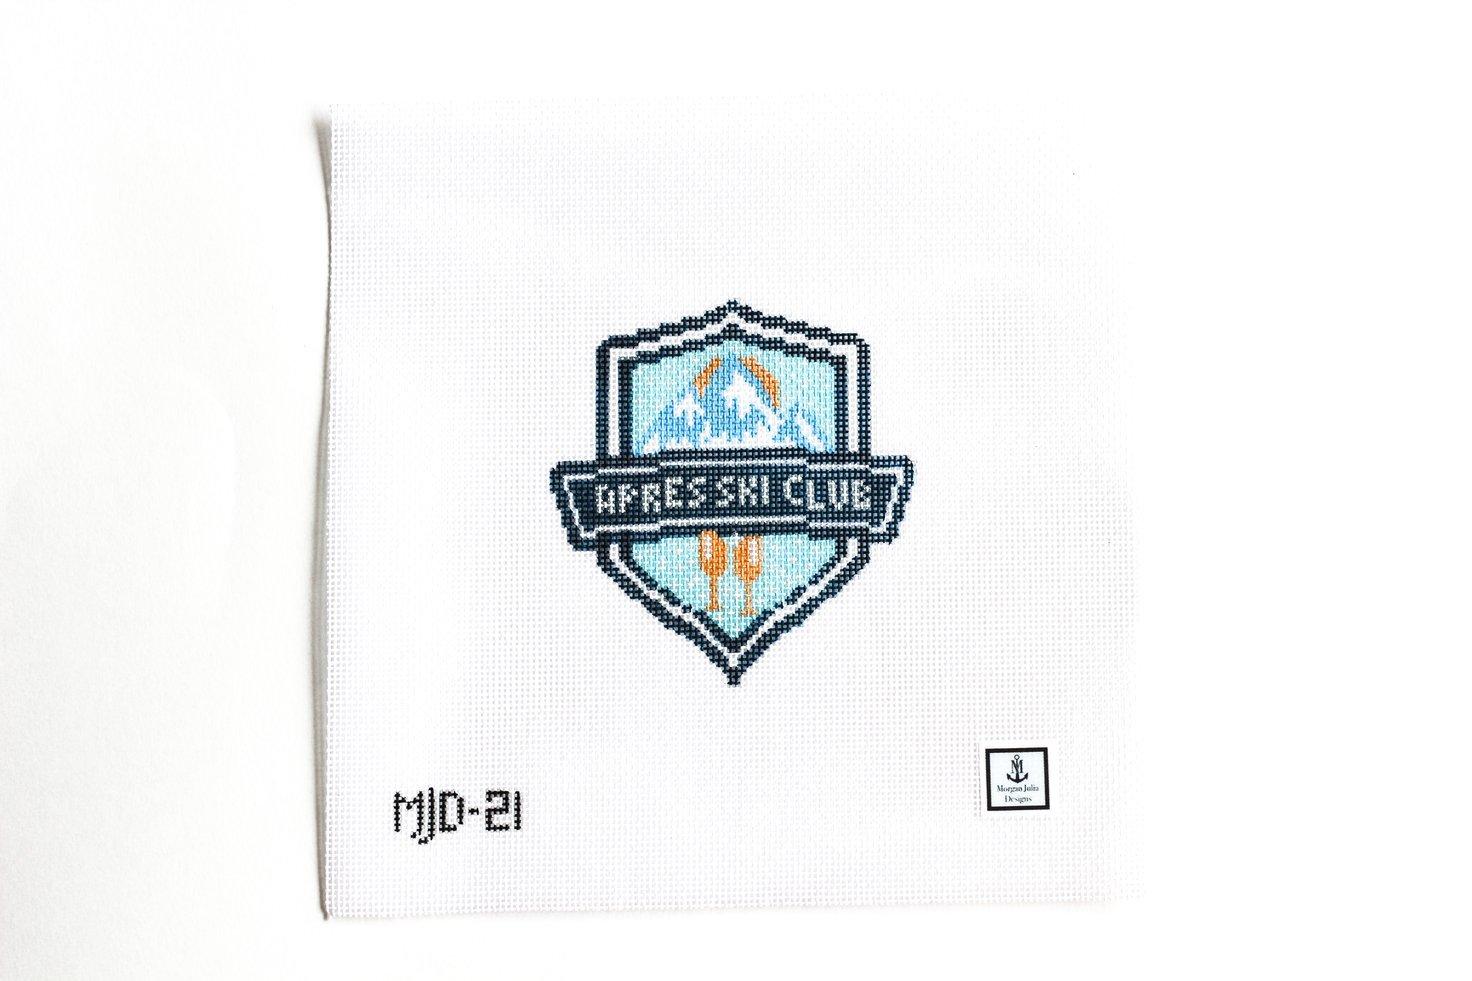 Apres Ski Club